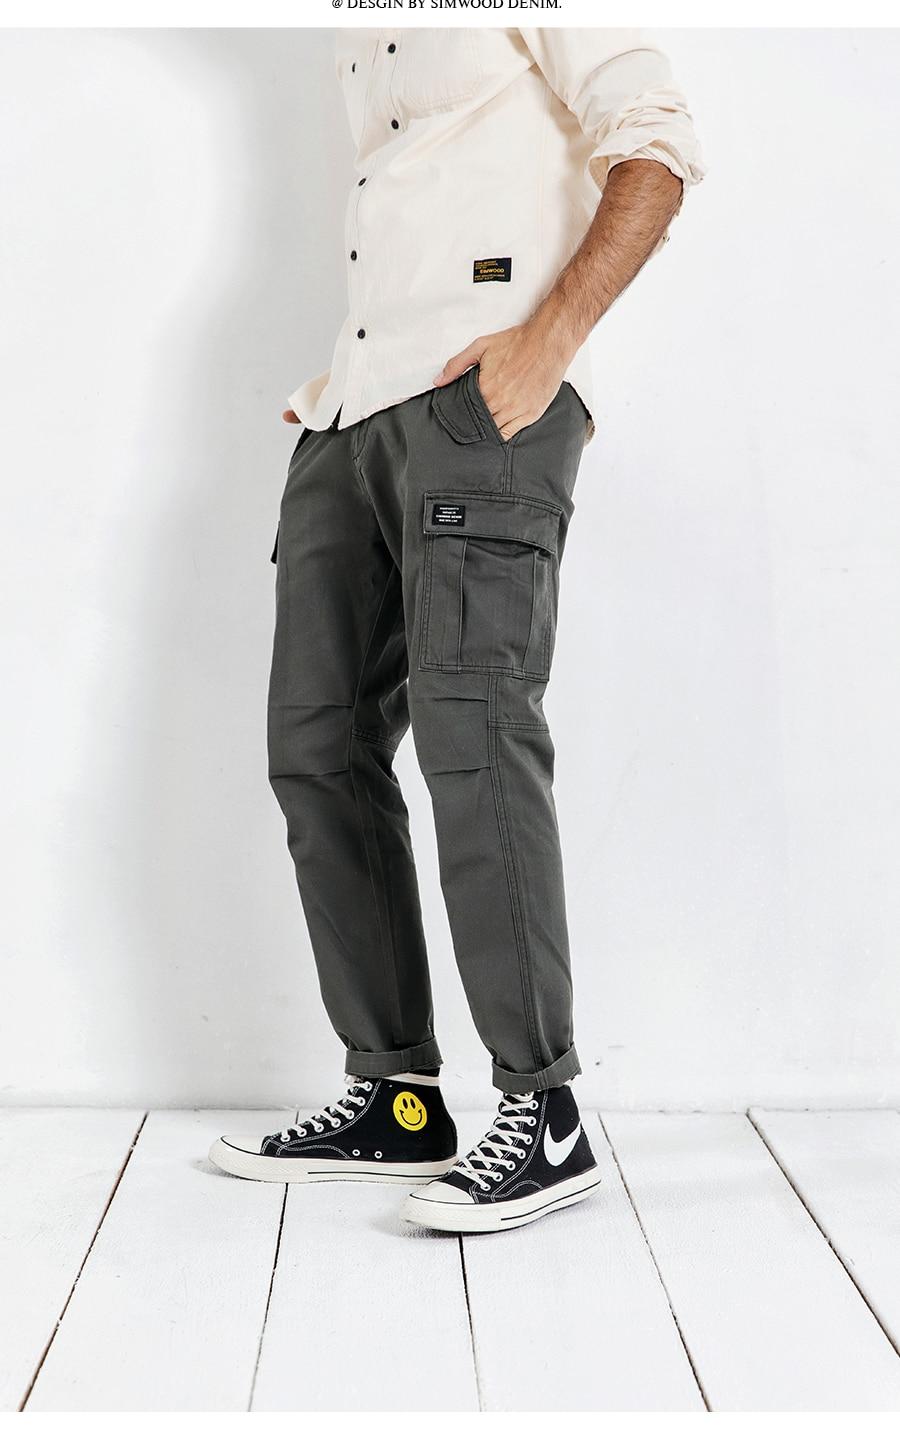 Hac13372e24414b758903e4834dcde0f9r SIMWOOD New 2019 Casual Pants Men Fashion track Cargo Pants Ankle-Length military autumn Trousers Men pantalon hombre 180614